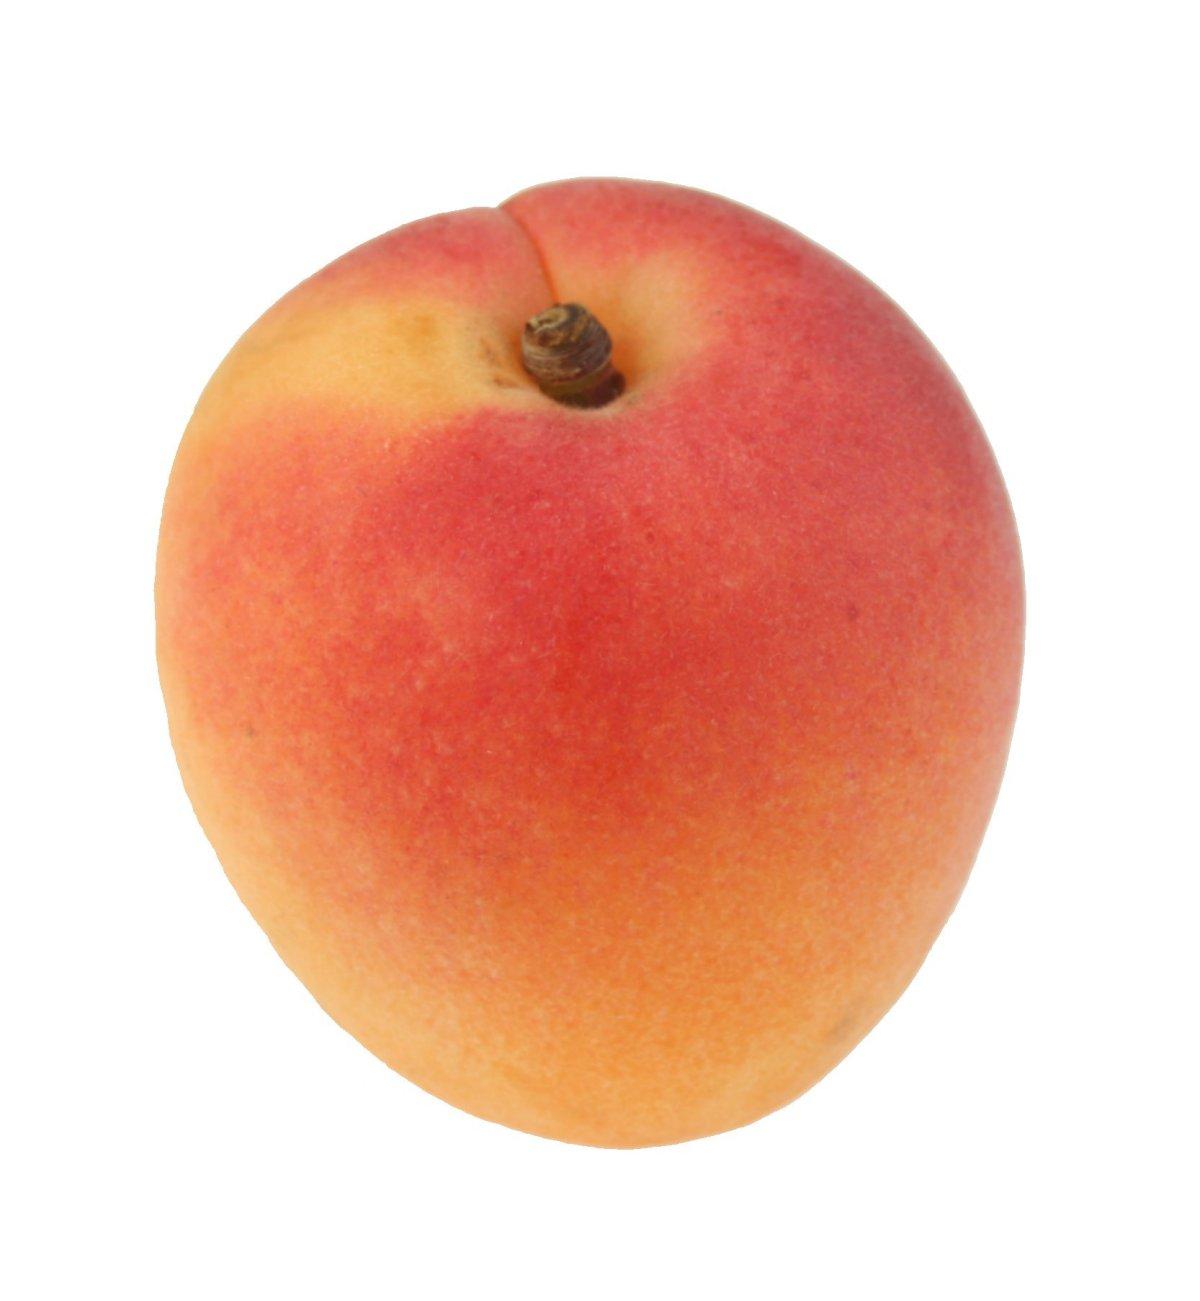 apricot01-lg.jpg